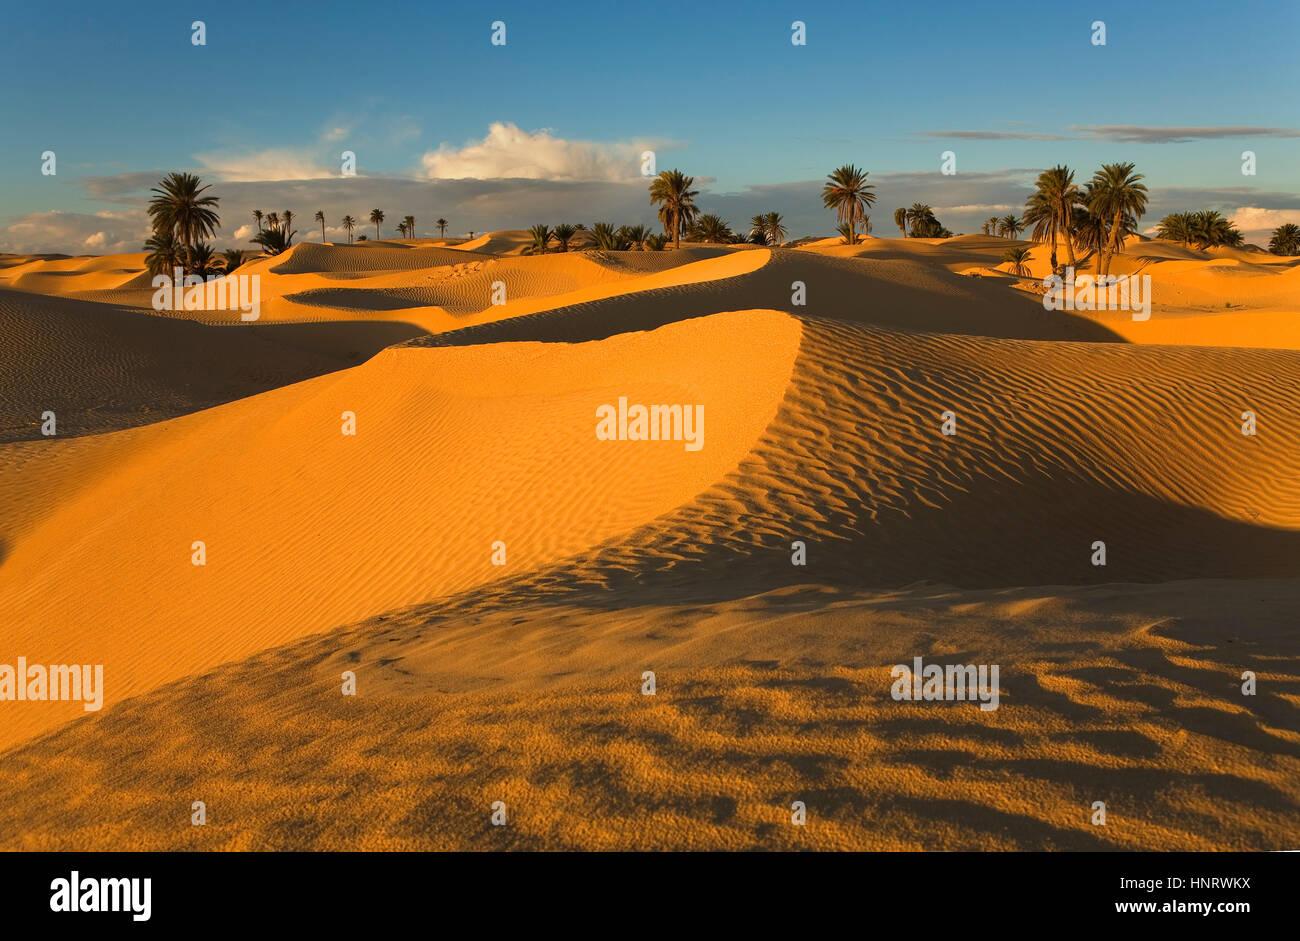 Túnez.zaafrane douz con (desierto). Imagen De Stock